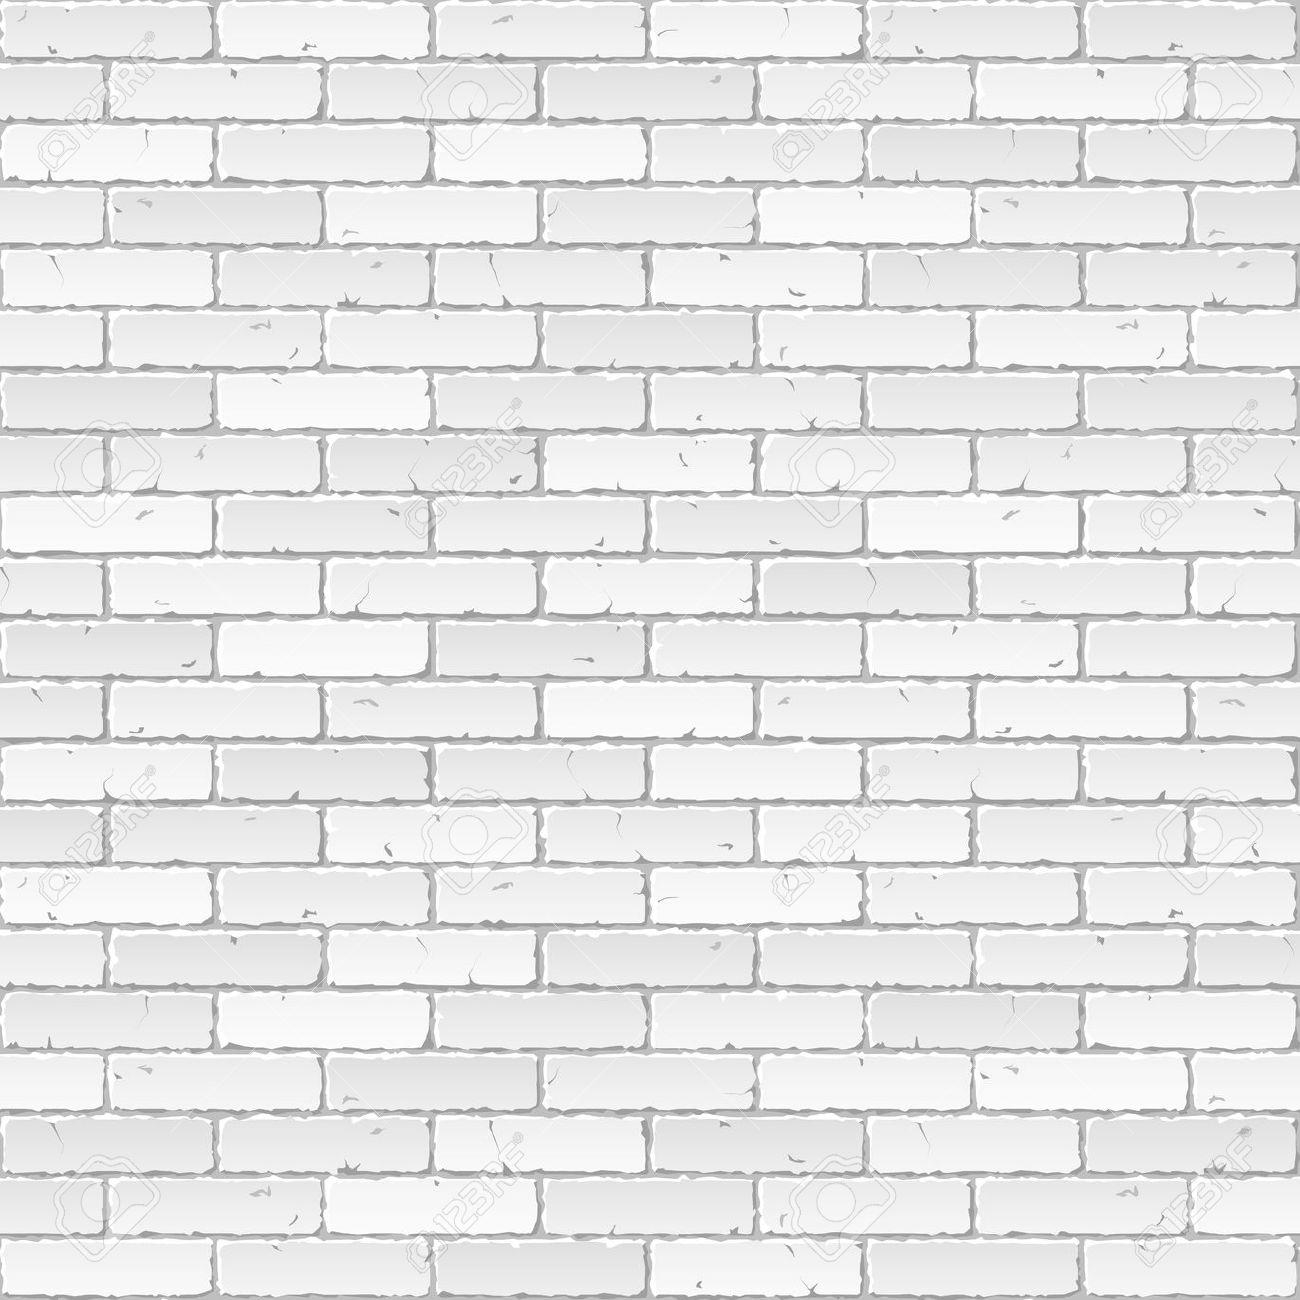 Home Design : Brick Wall Black And White Clipart Bar Garage brick.